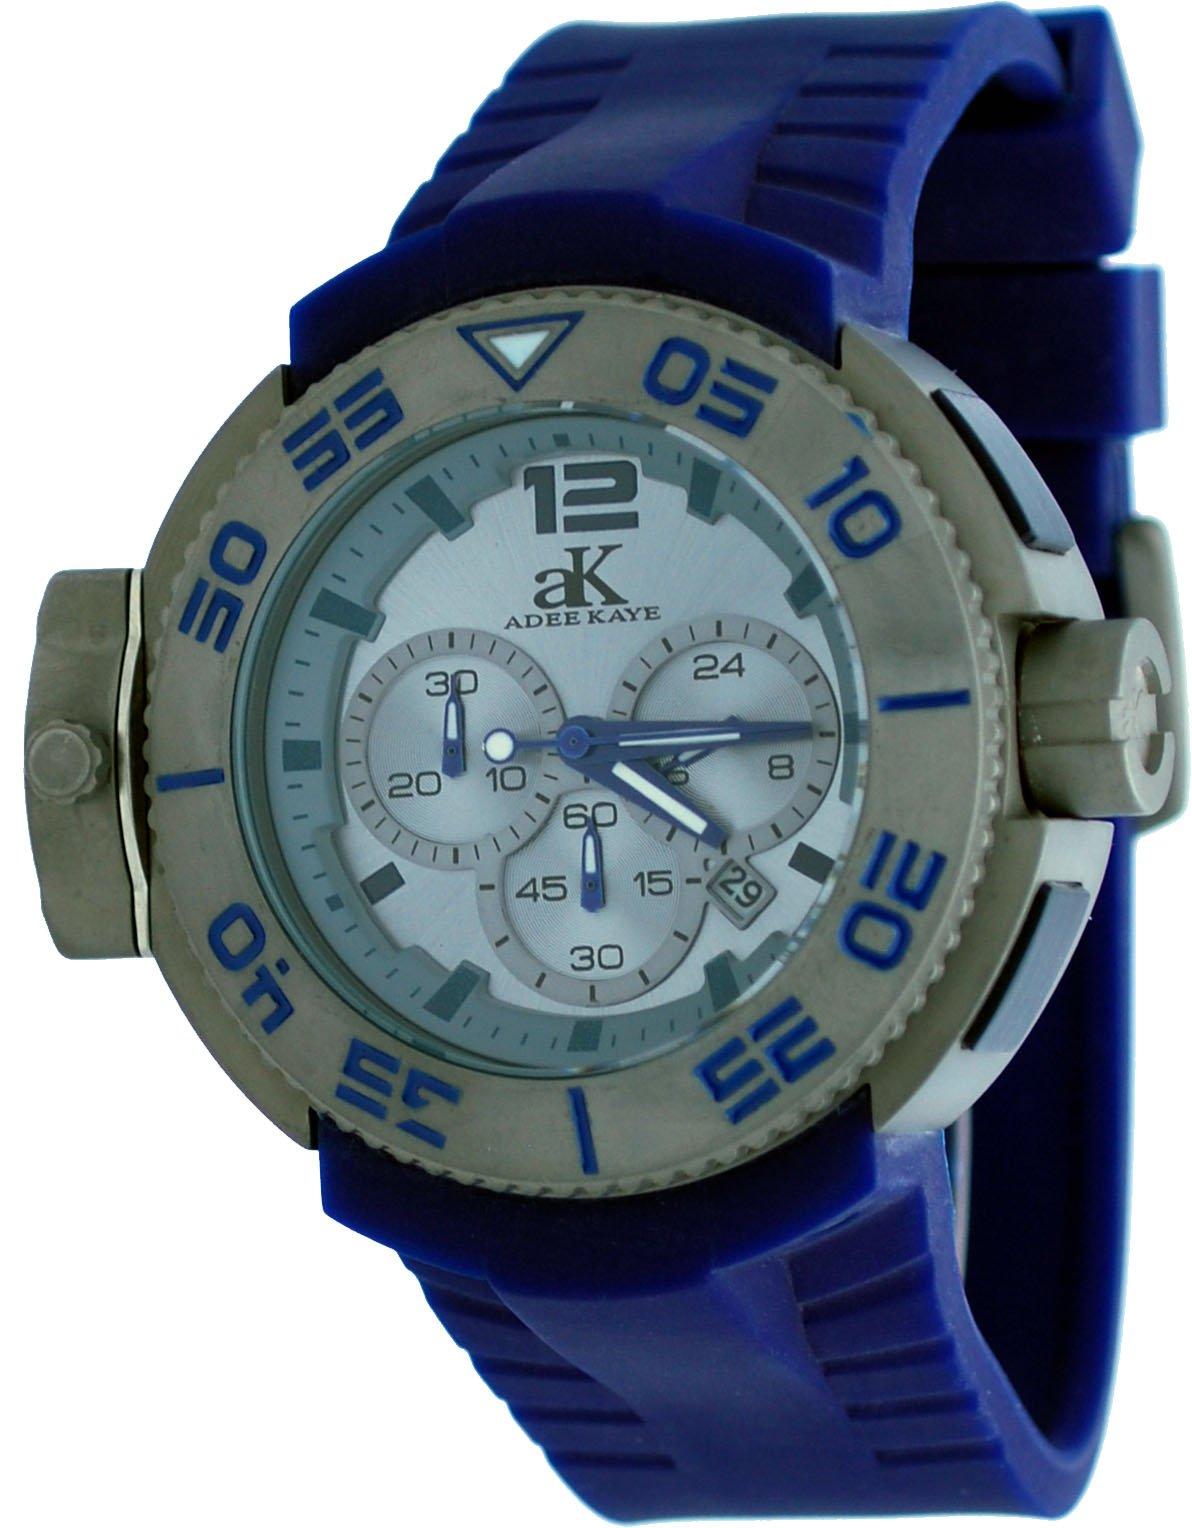 Adee Kaye #AK8006-MIPG Men's Grey IP Resin Band Dual Time Chrongraph Watch by Adee Kaye